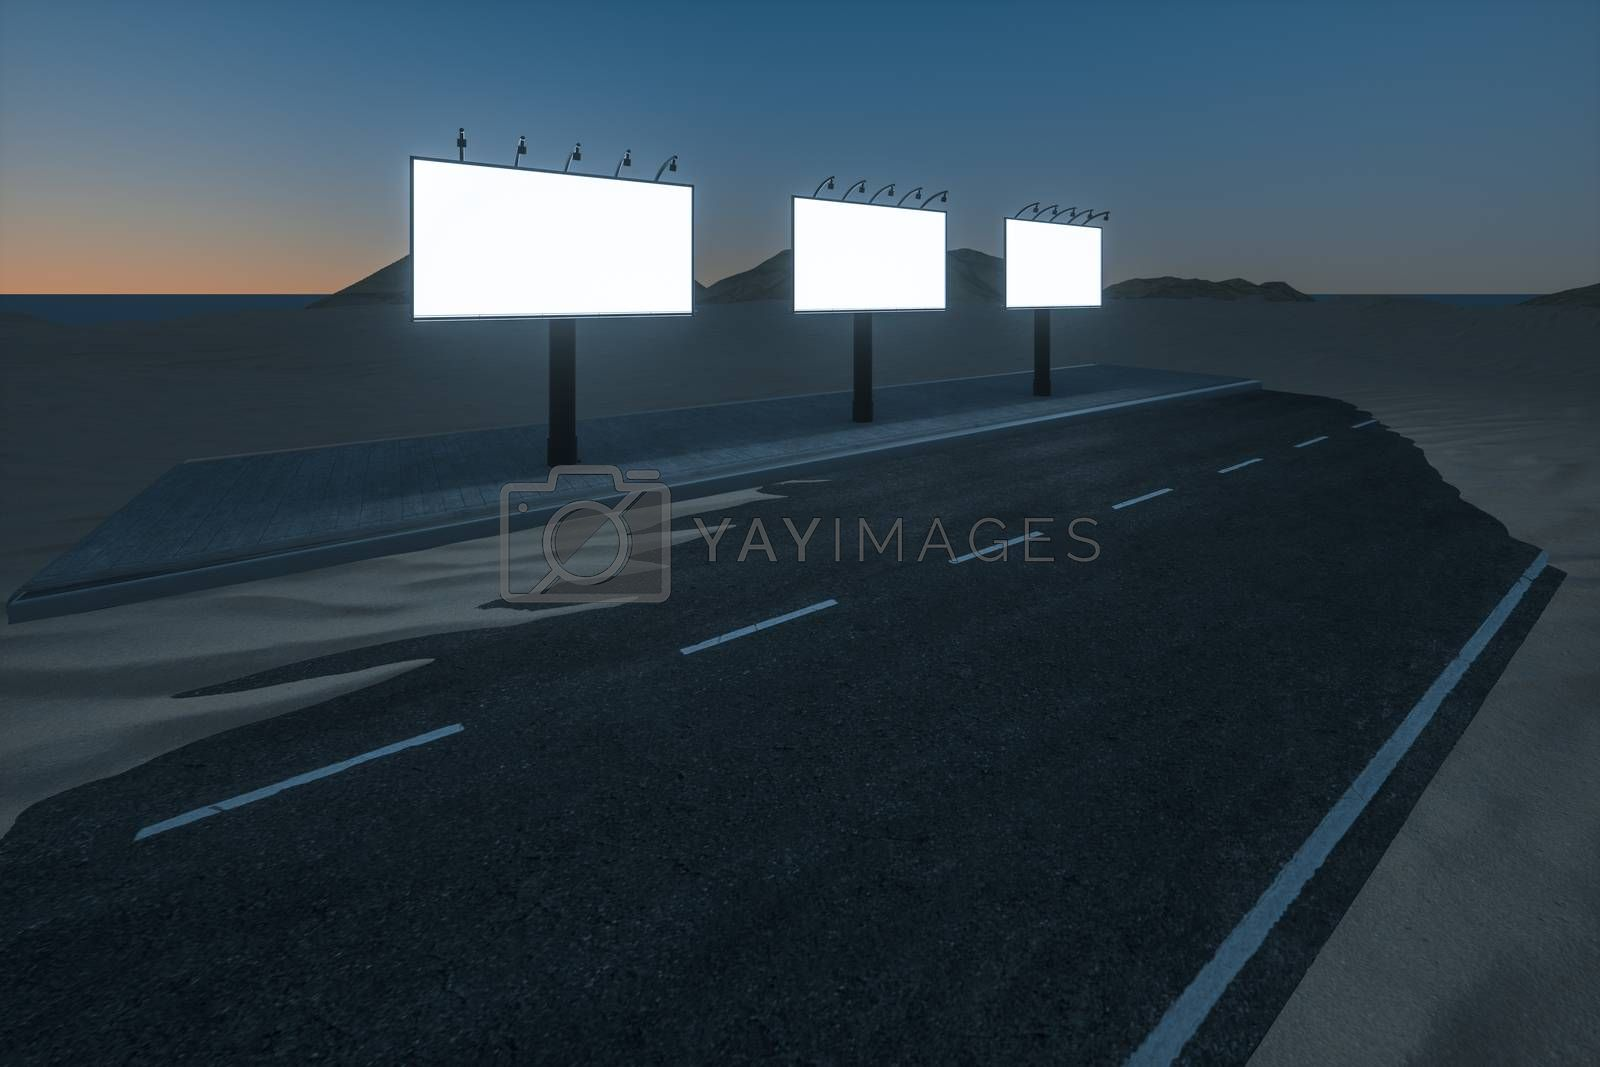 3d rendering, advertising billboard on the side of road. by vinkfan